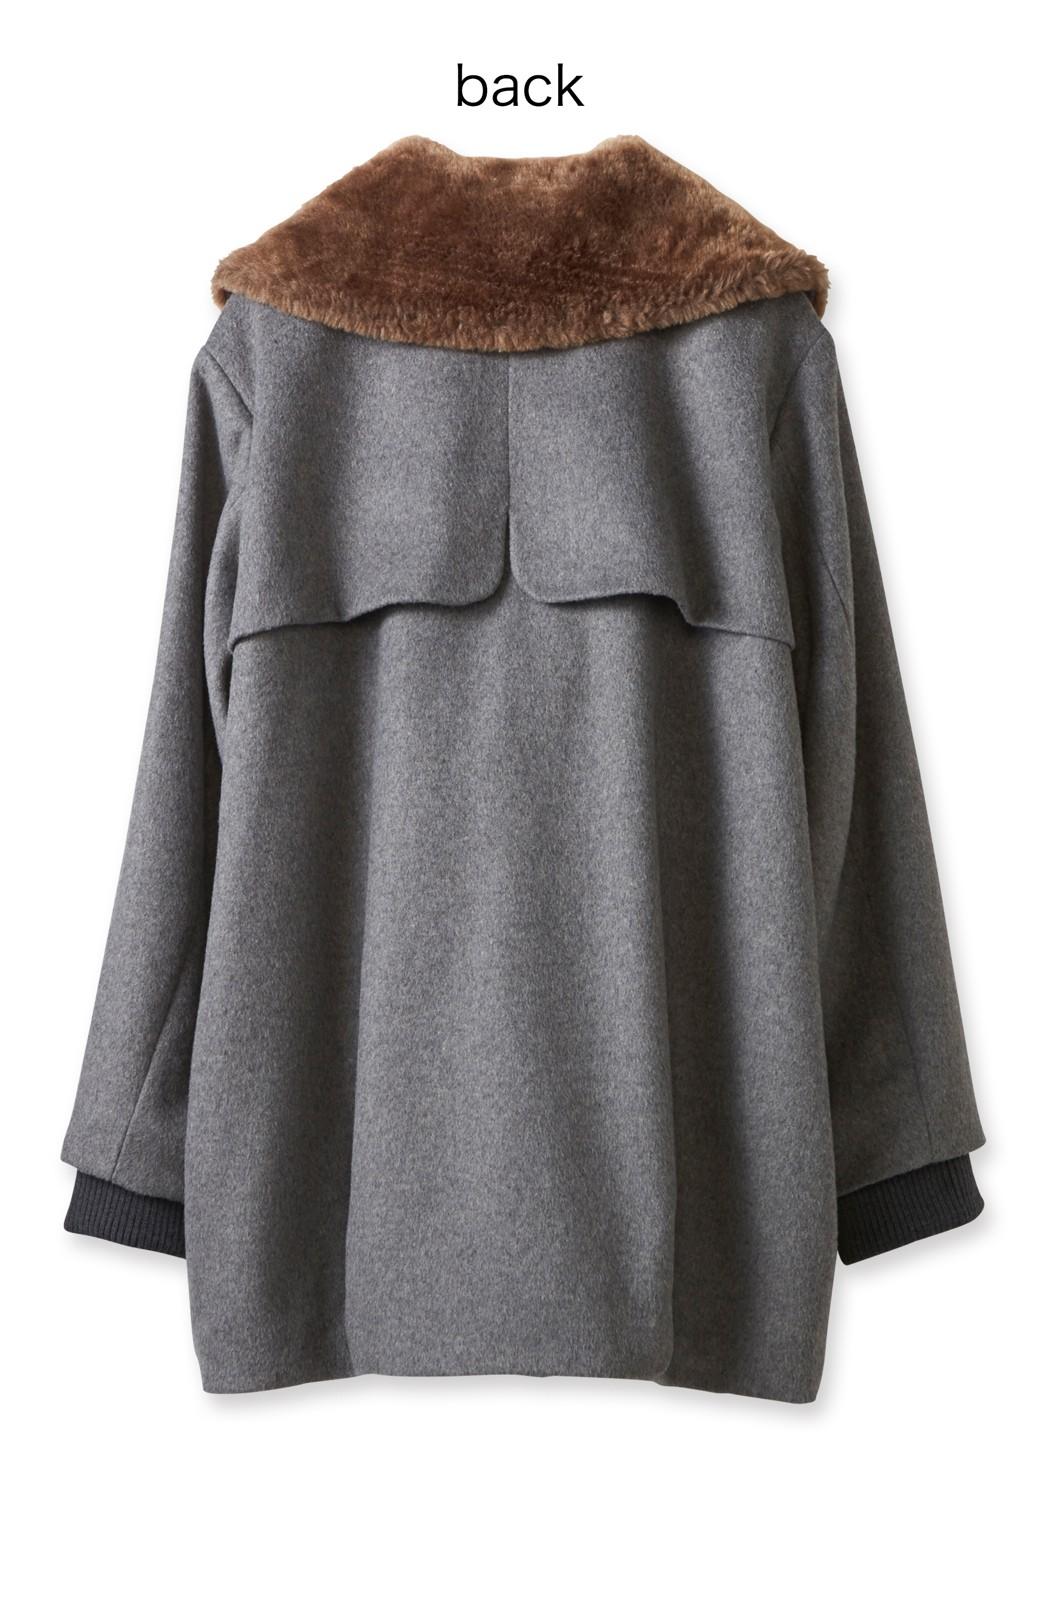 pilvee 取り外しフェイクファー衿付き ウール混のノーカラーコート <グレー>の商品写真2